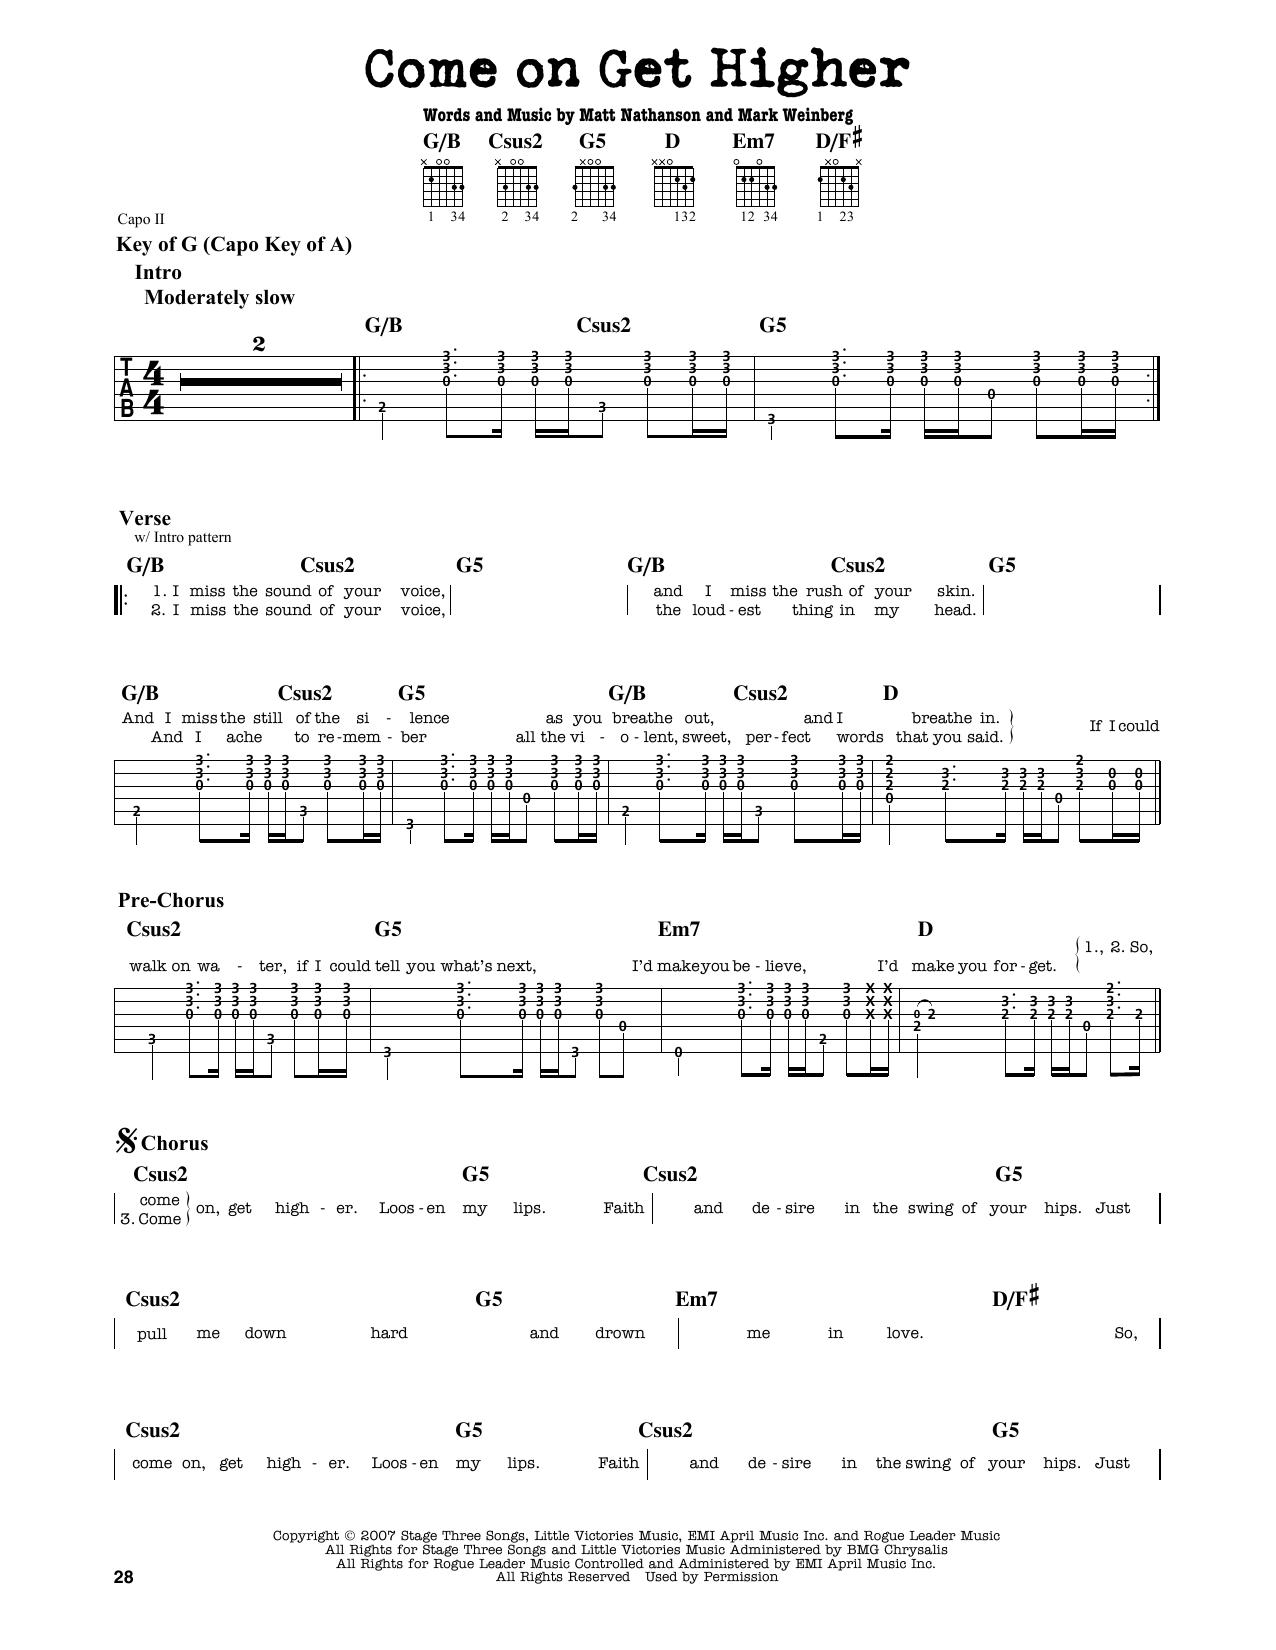 Sheet Music Digital Files To Print   Licensed Mark Weinberg ...